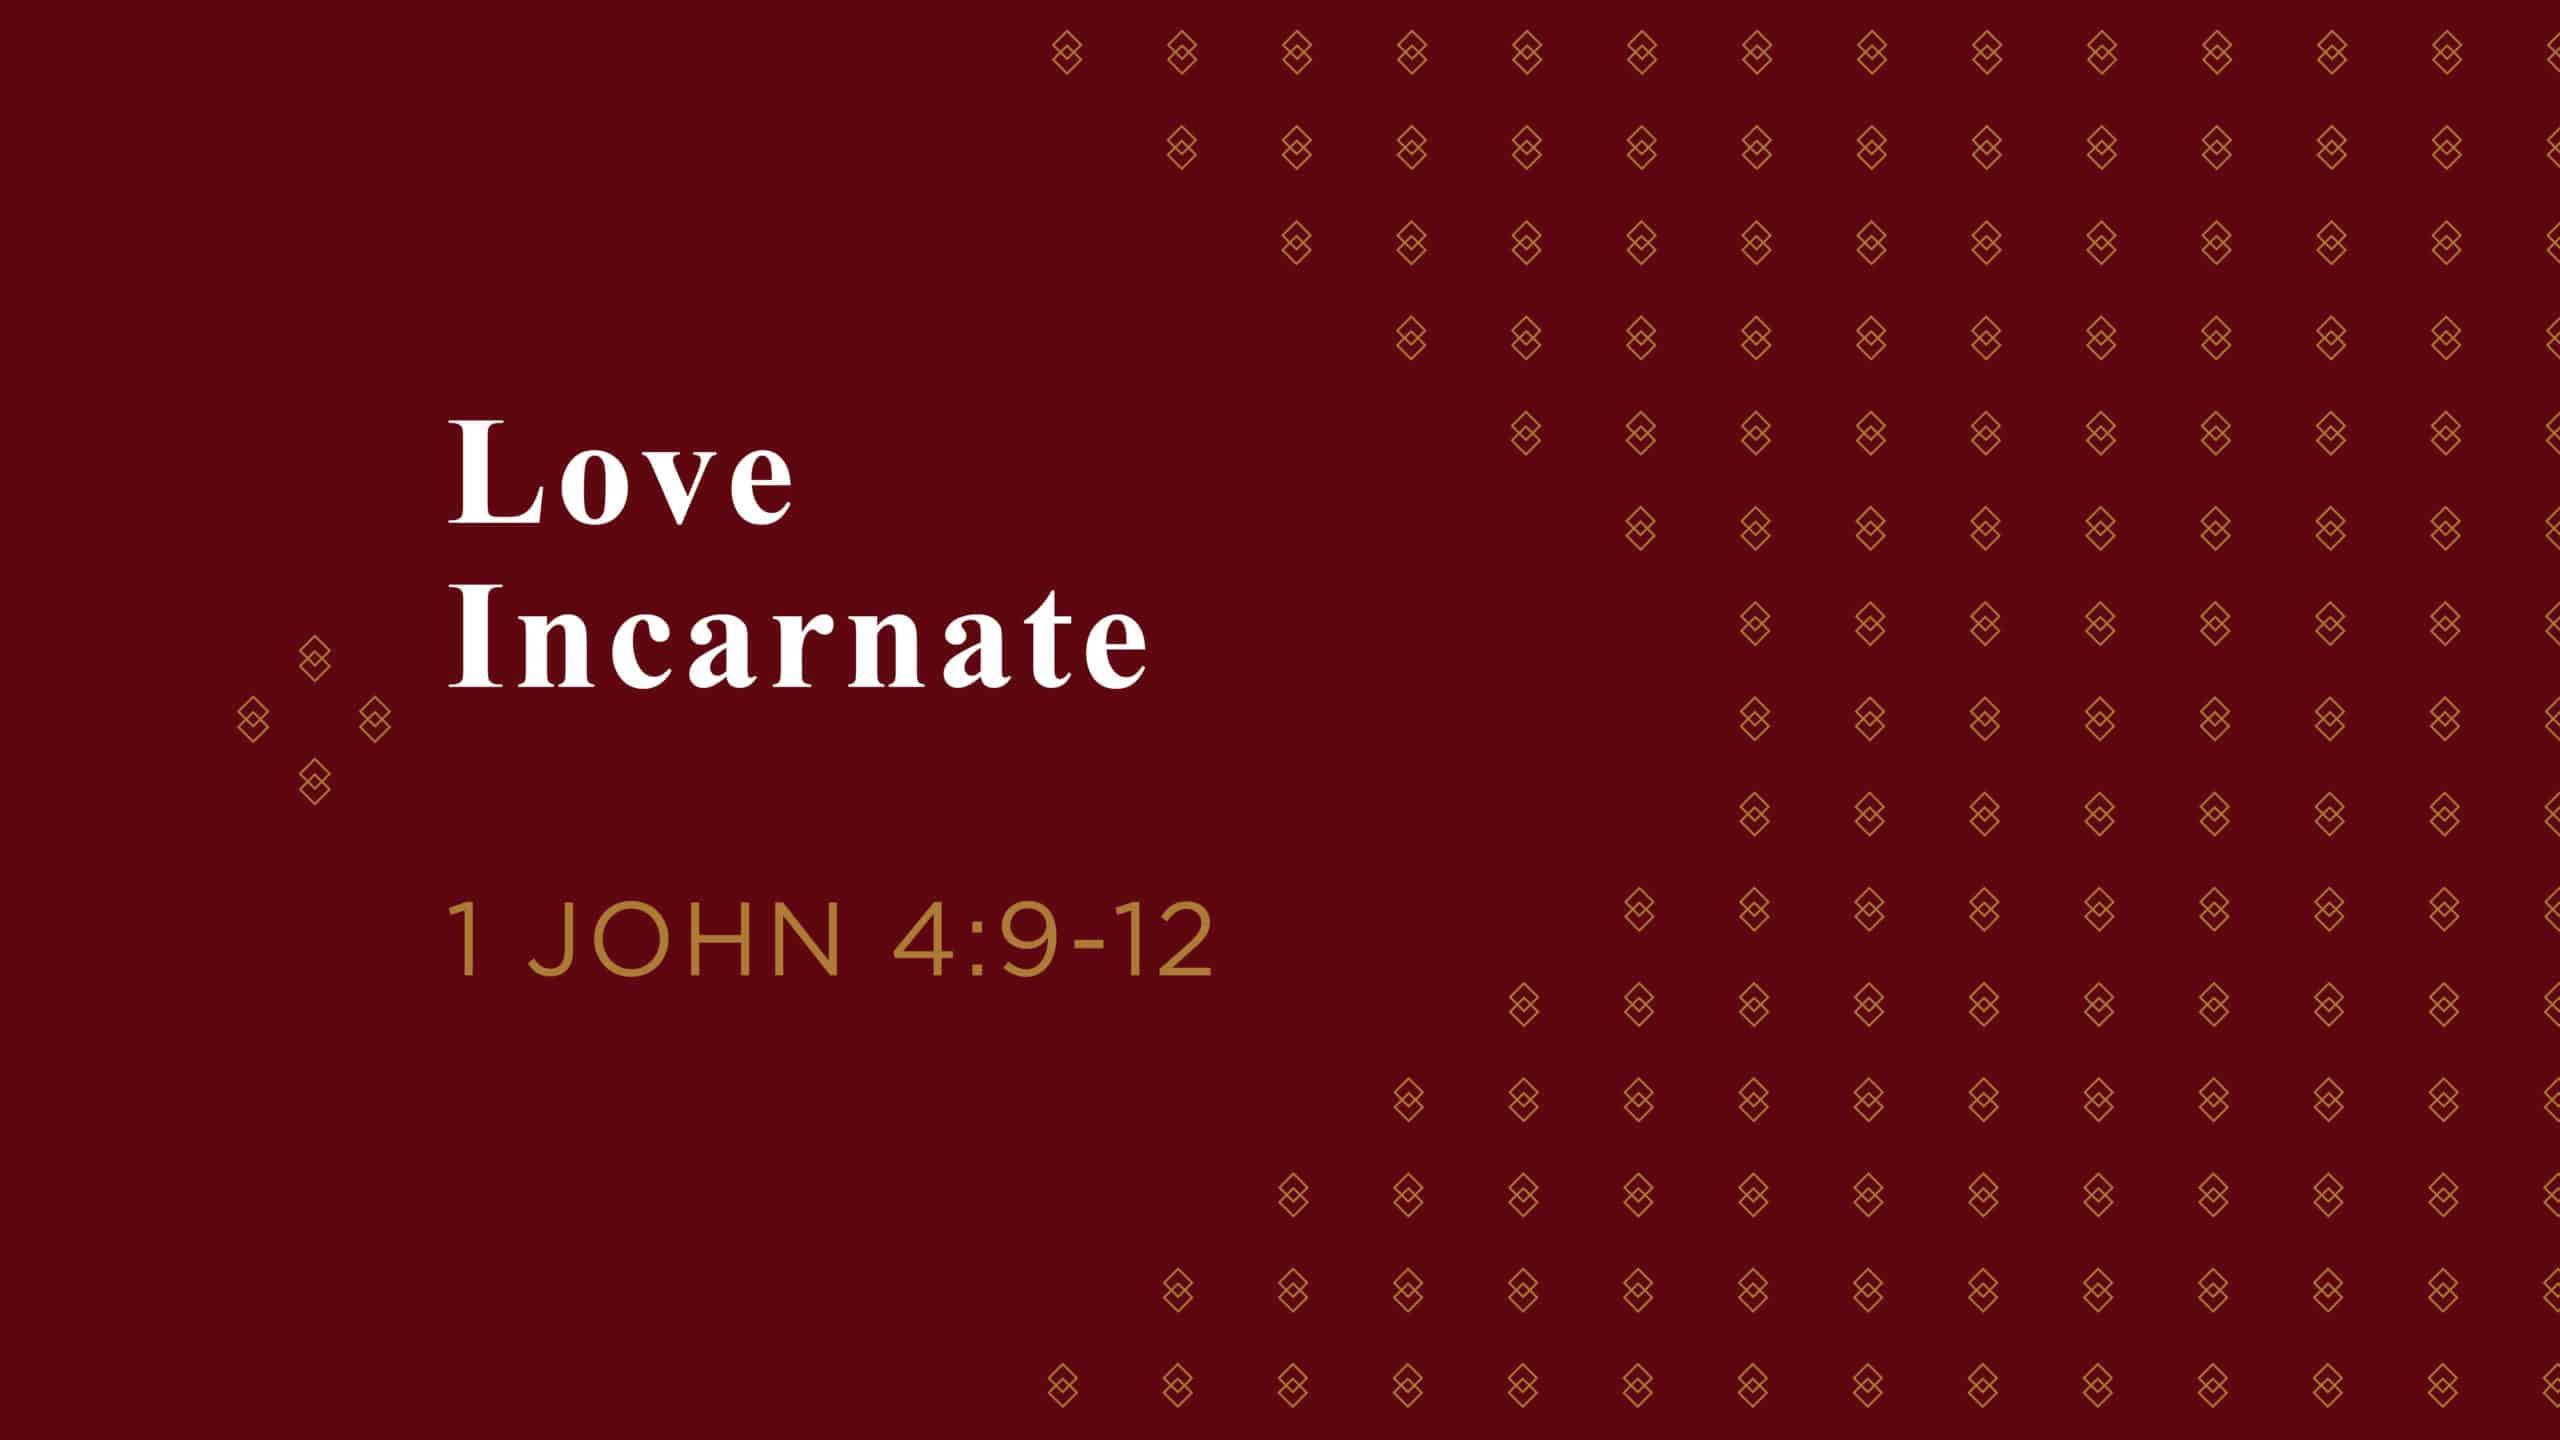 Love Incarnate